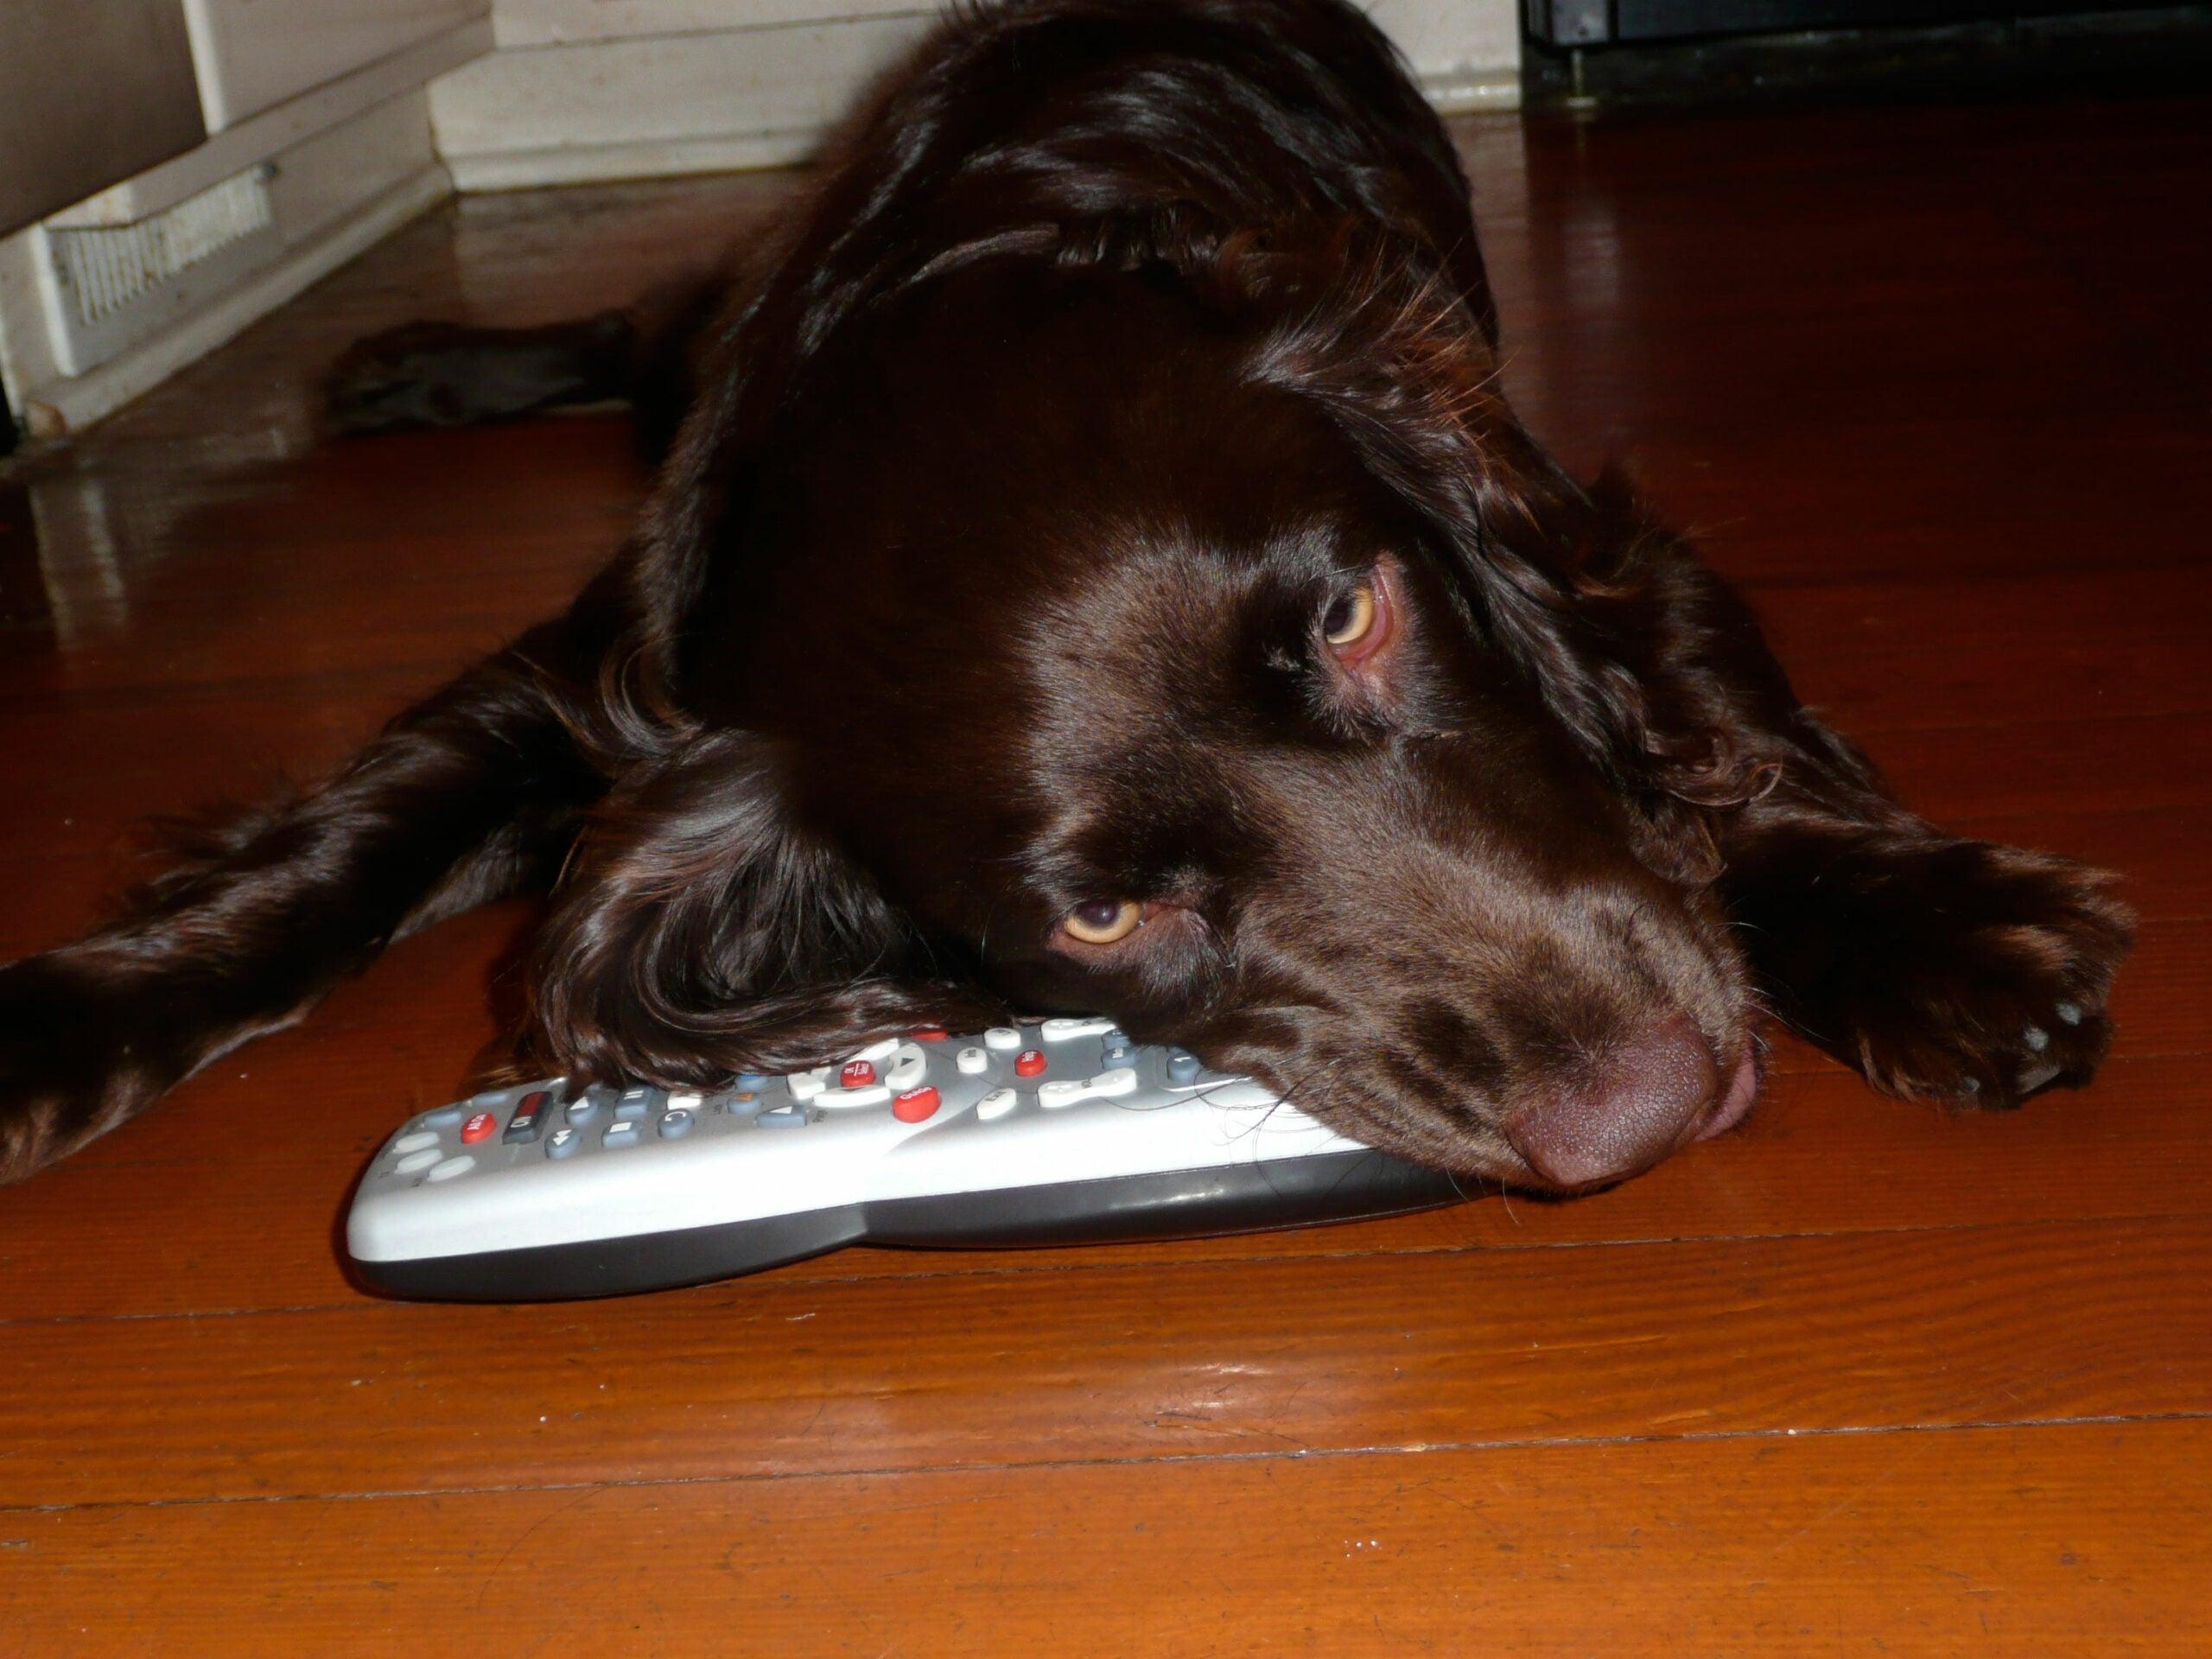 Appetite for Destruction: When Good Dogs Chew